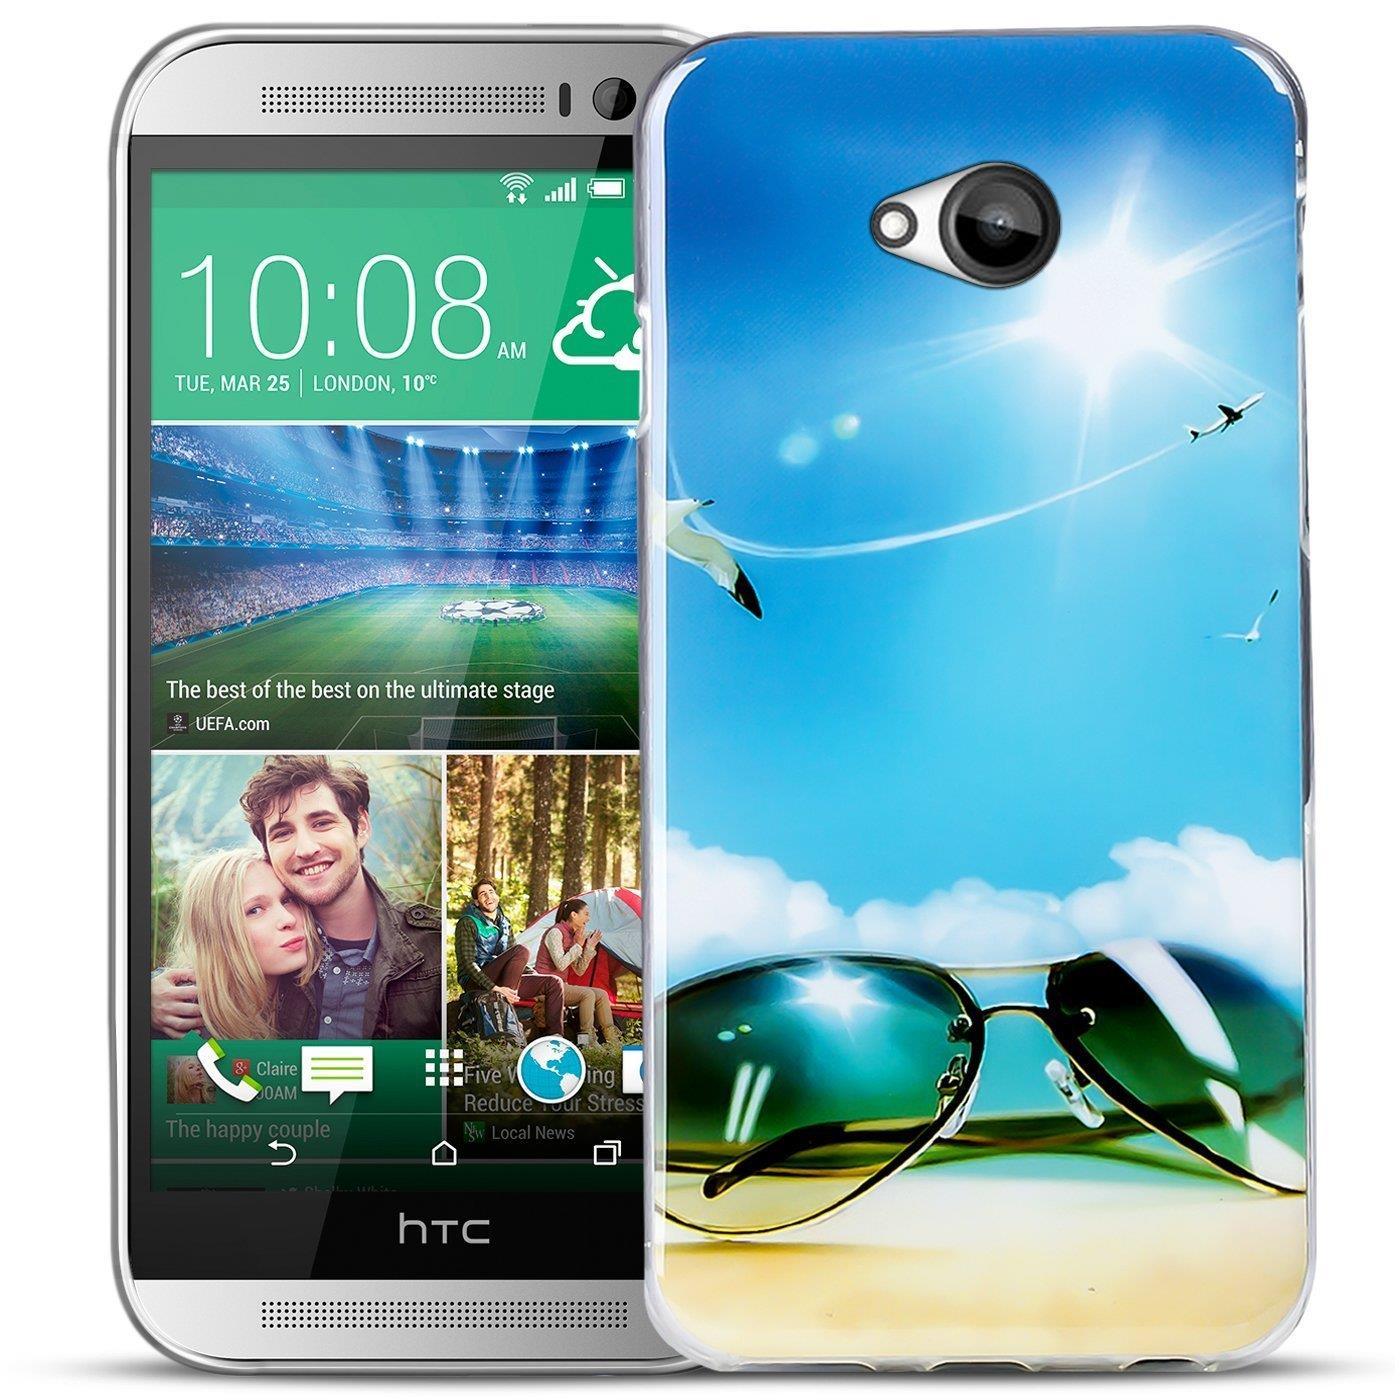 COQUE-pour-HTC-Etui-Telephone-Portable-Motif-Protection-Poche-Mince-Silicone-TPU